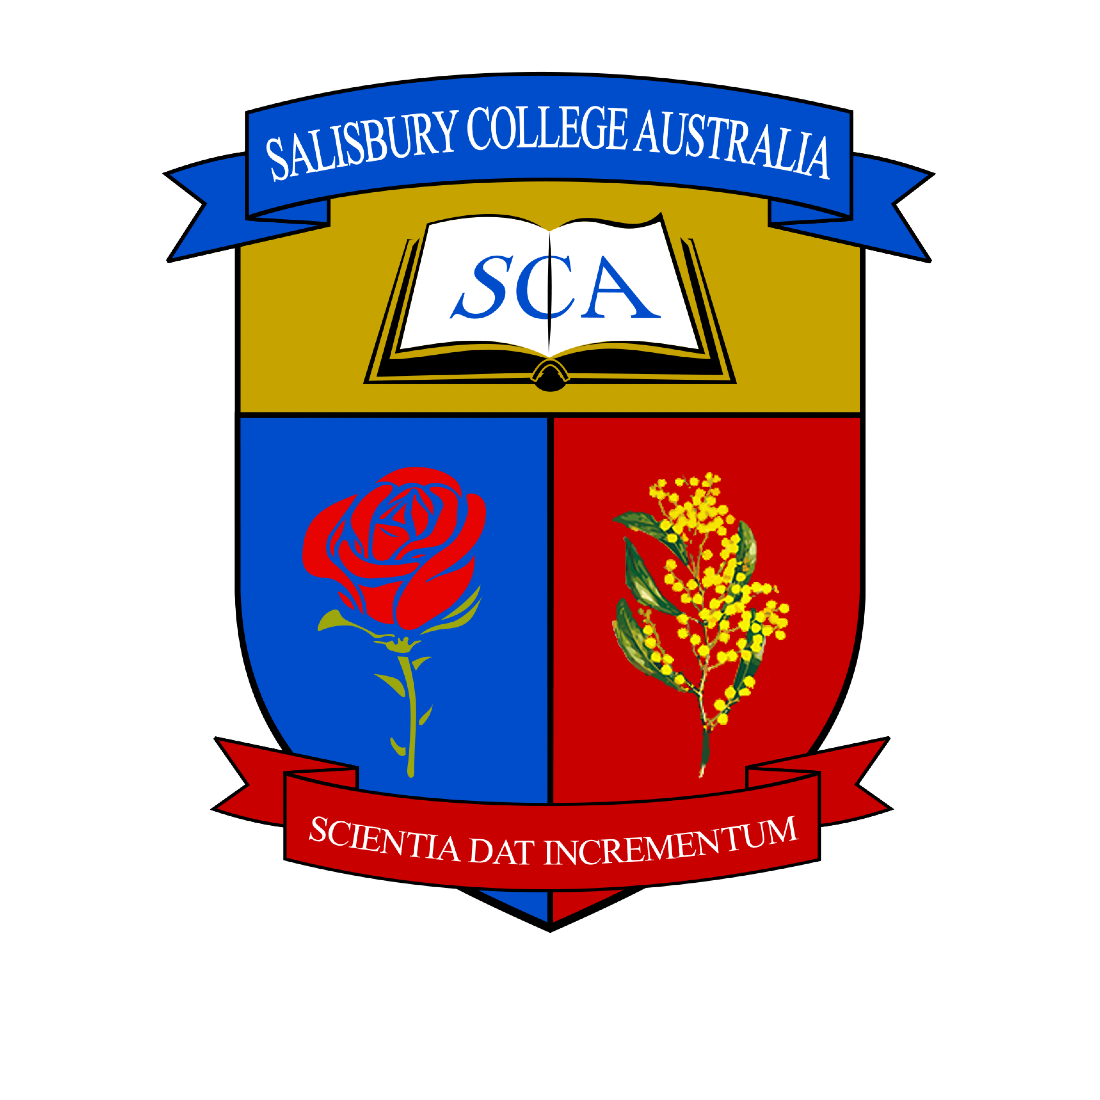 Salisbury College Australia